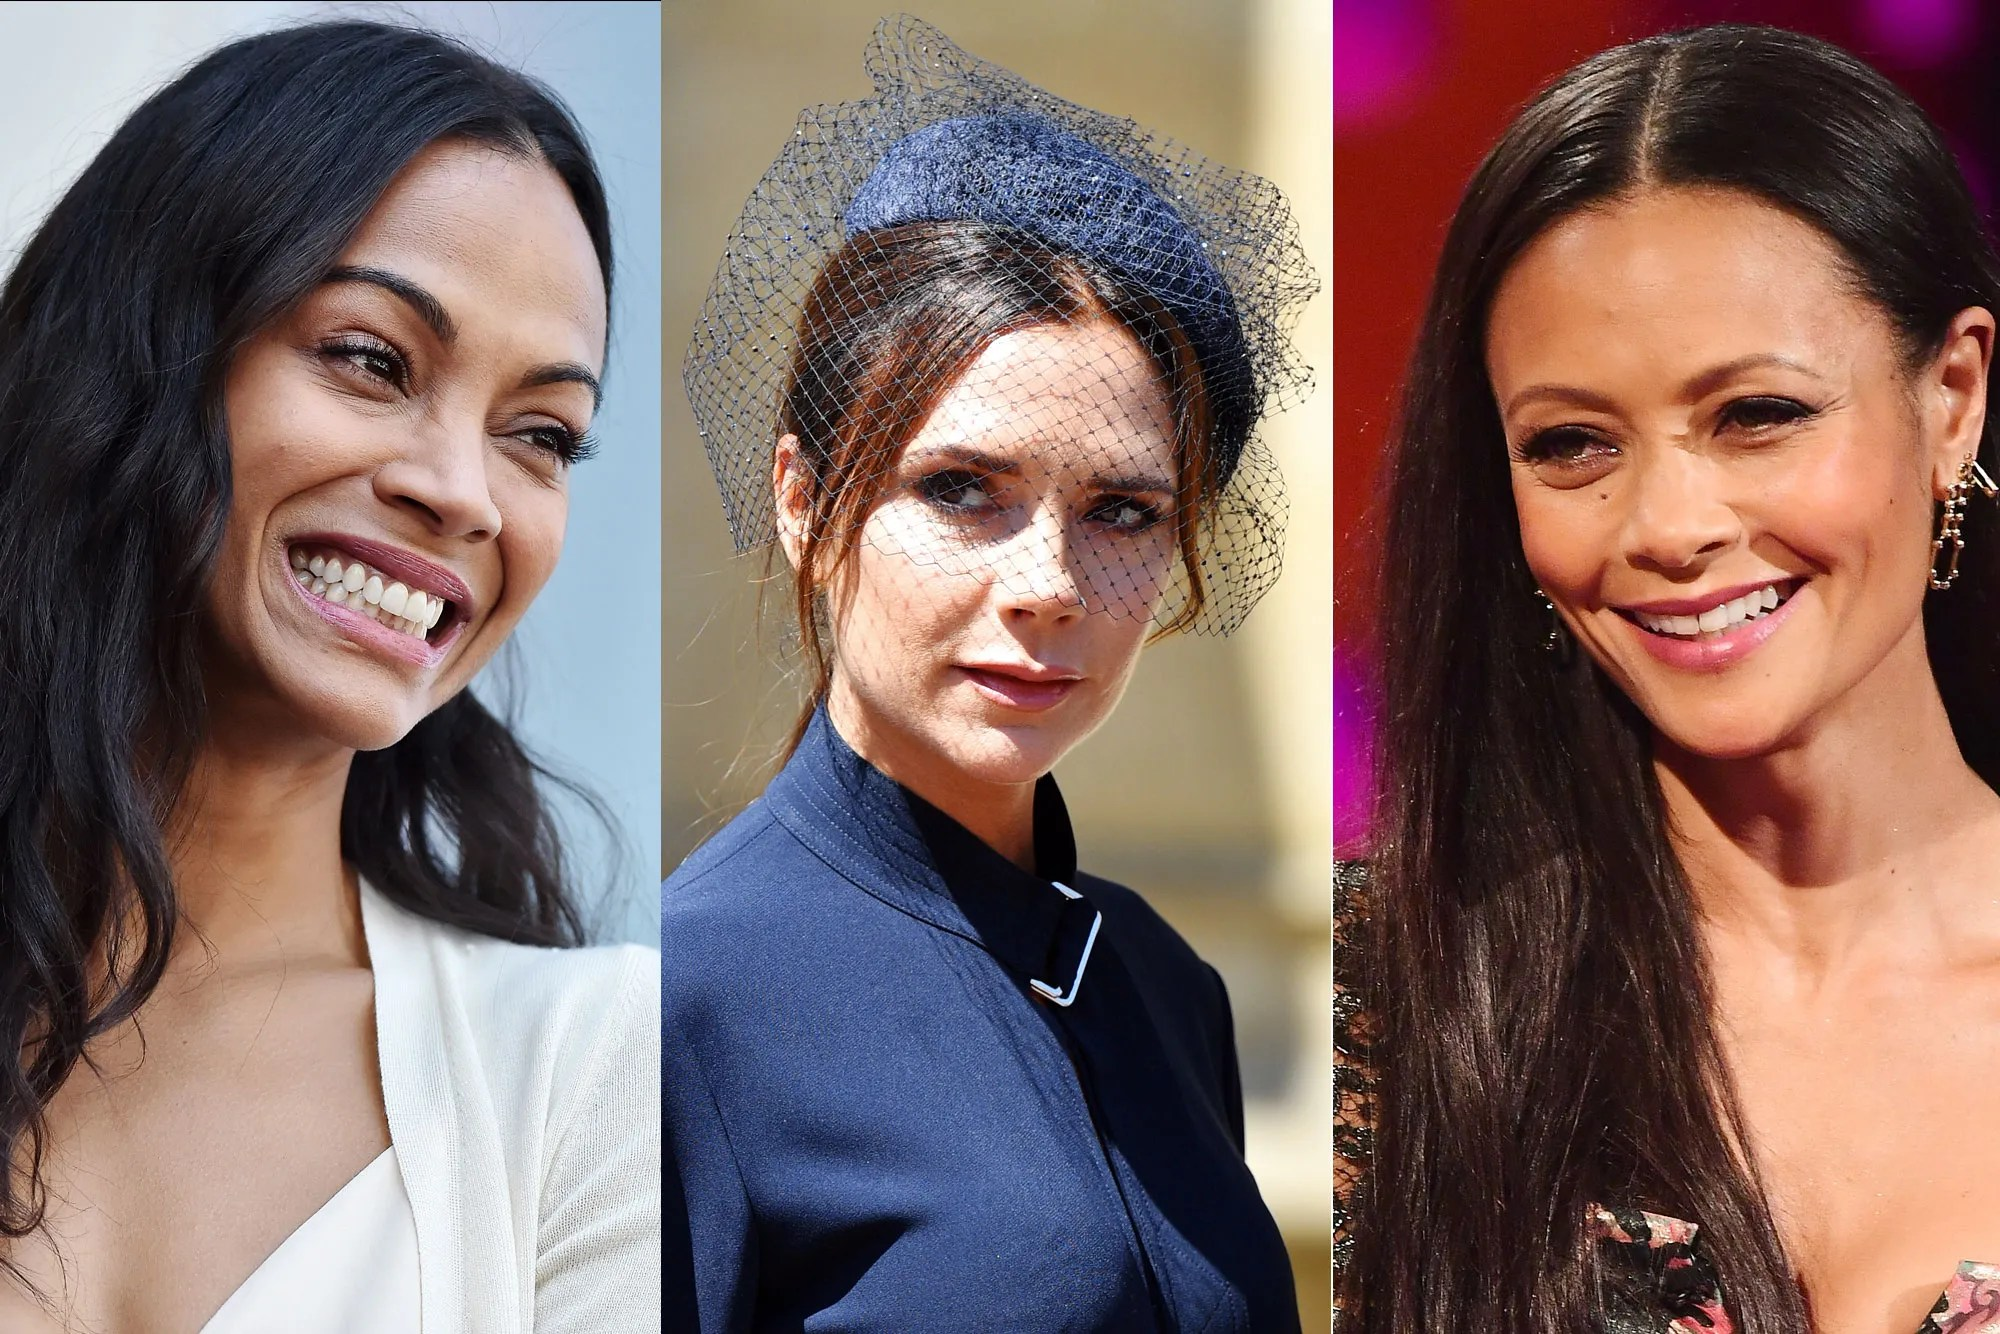 Compleet met uitgebreide filminformatie en trailers. Victoria Beckham Mistook Thandie Newton For Pregnant Zoe Saldana At Soulcycle Vanity Fair